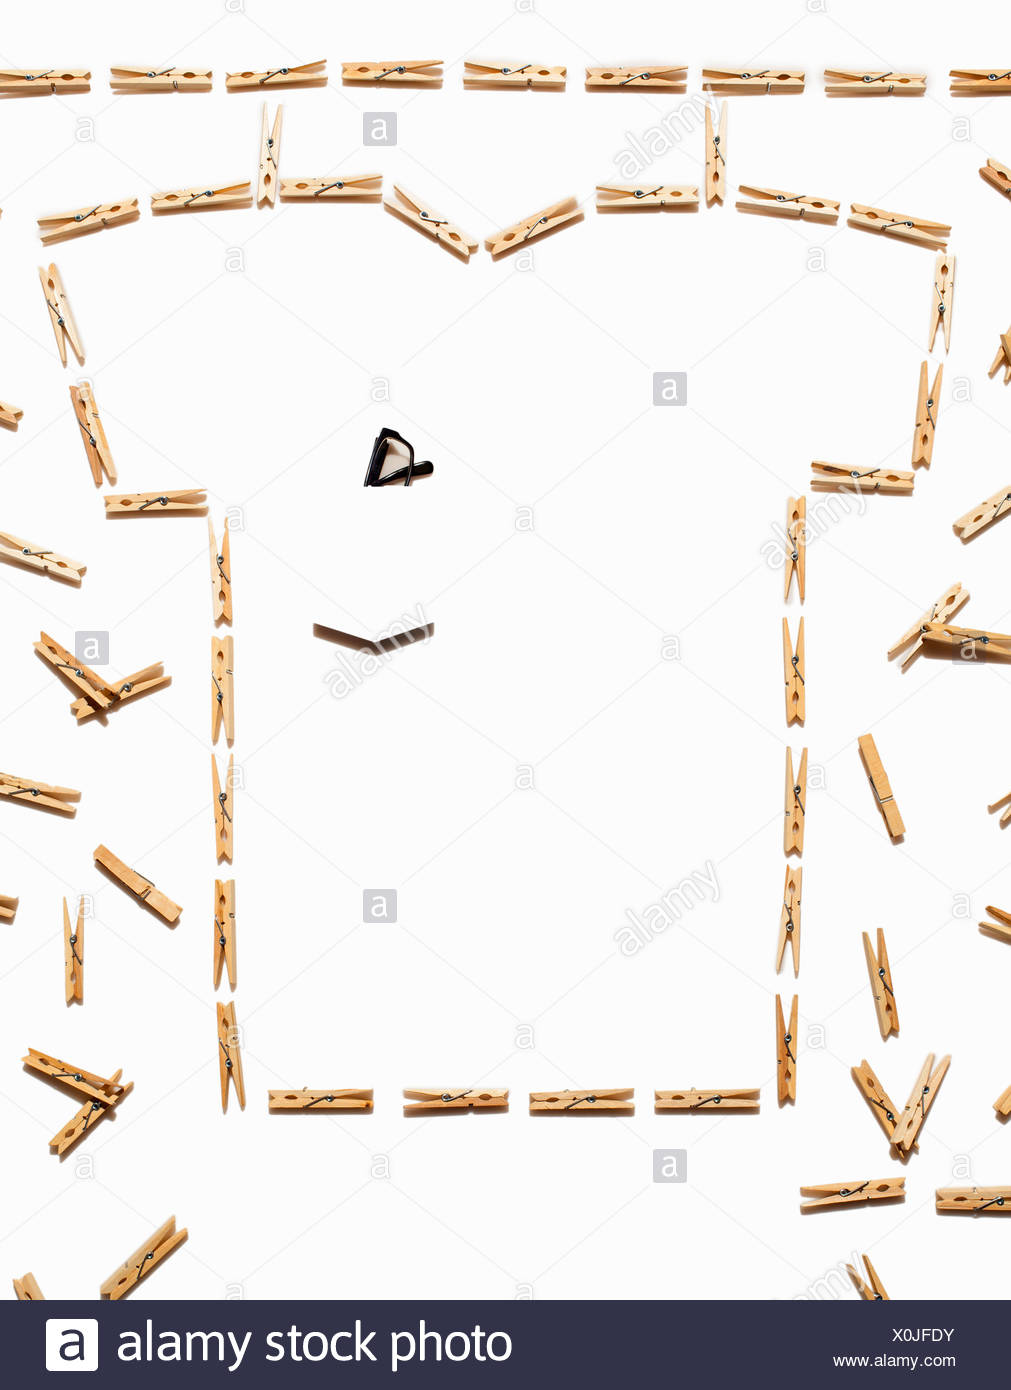 Tshirt blanco esbozadas con broches sobre fondo blanco. Imagen De Stock